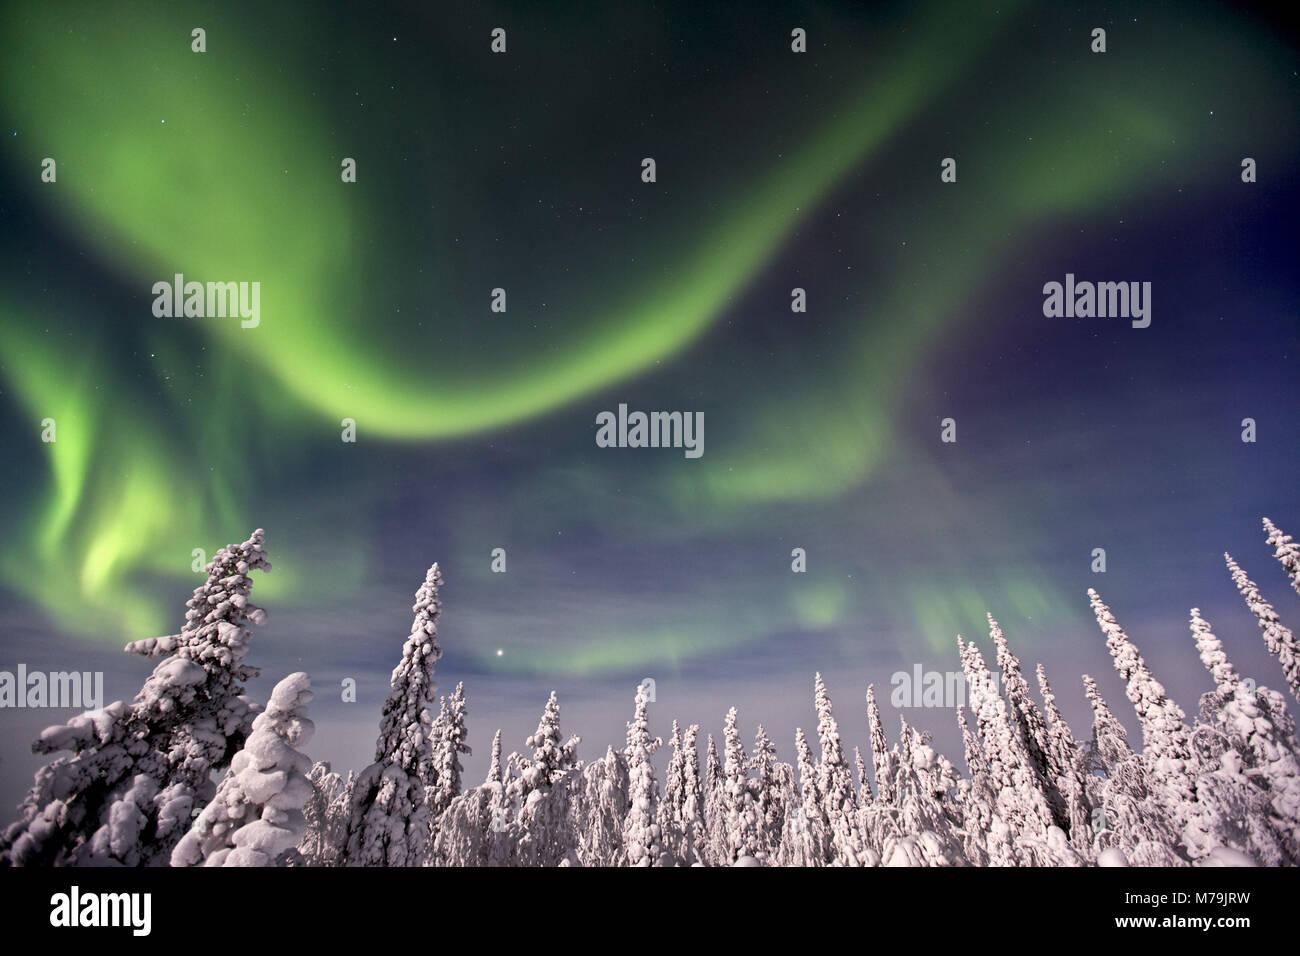 Sweden, Lapland, northern lights, Aurora borealis, - Stock Image